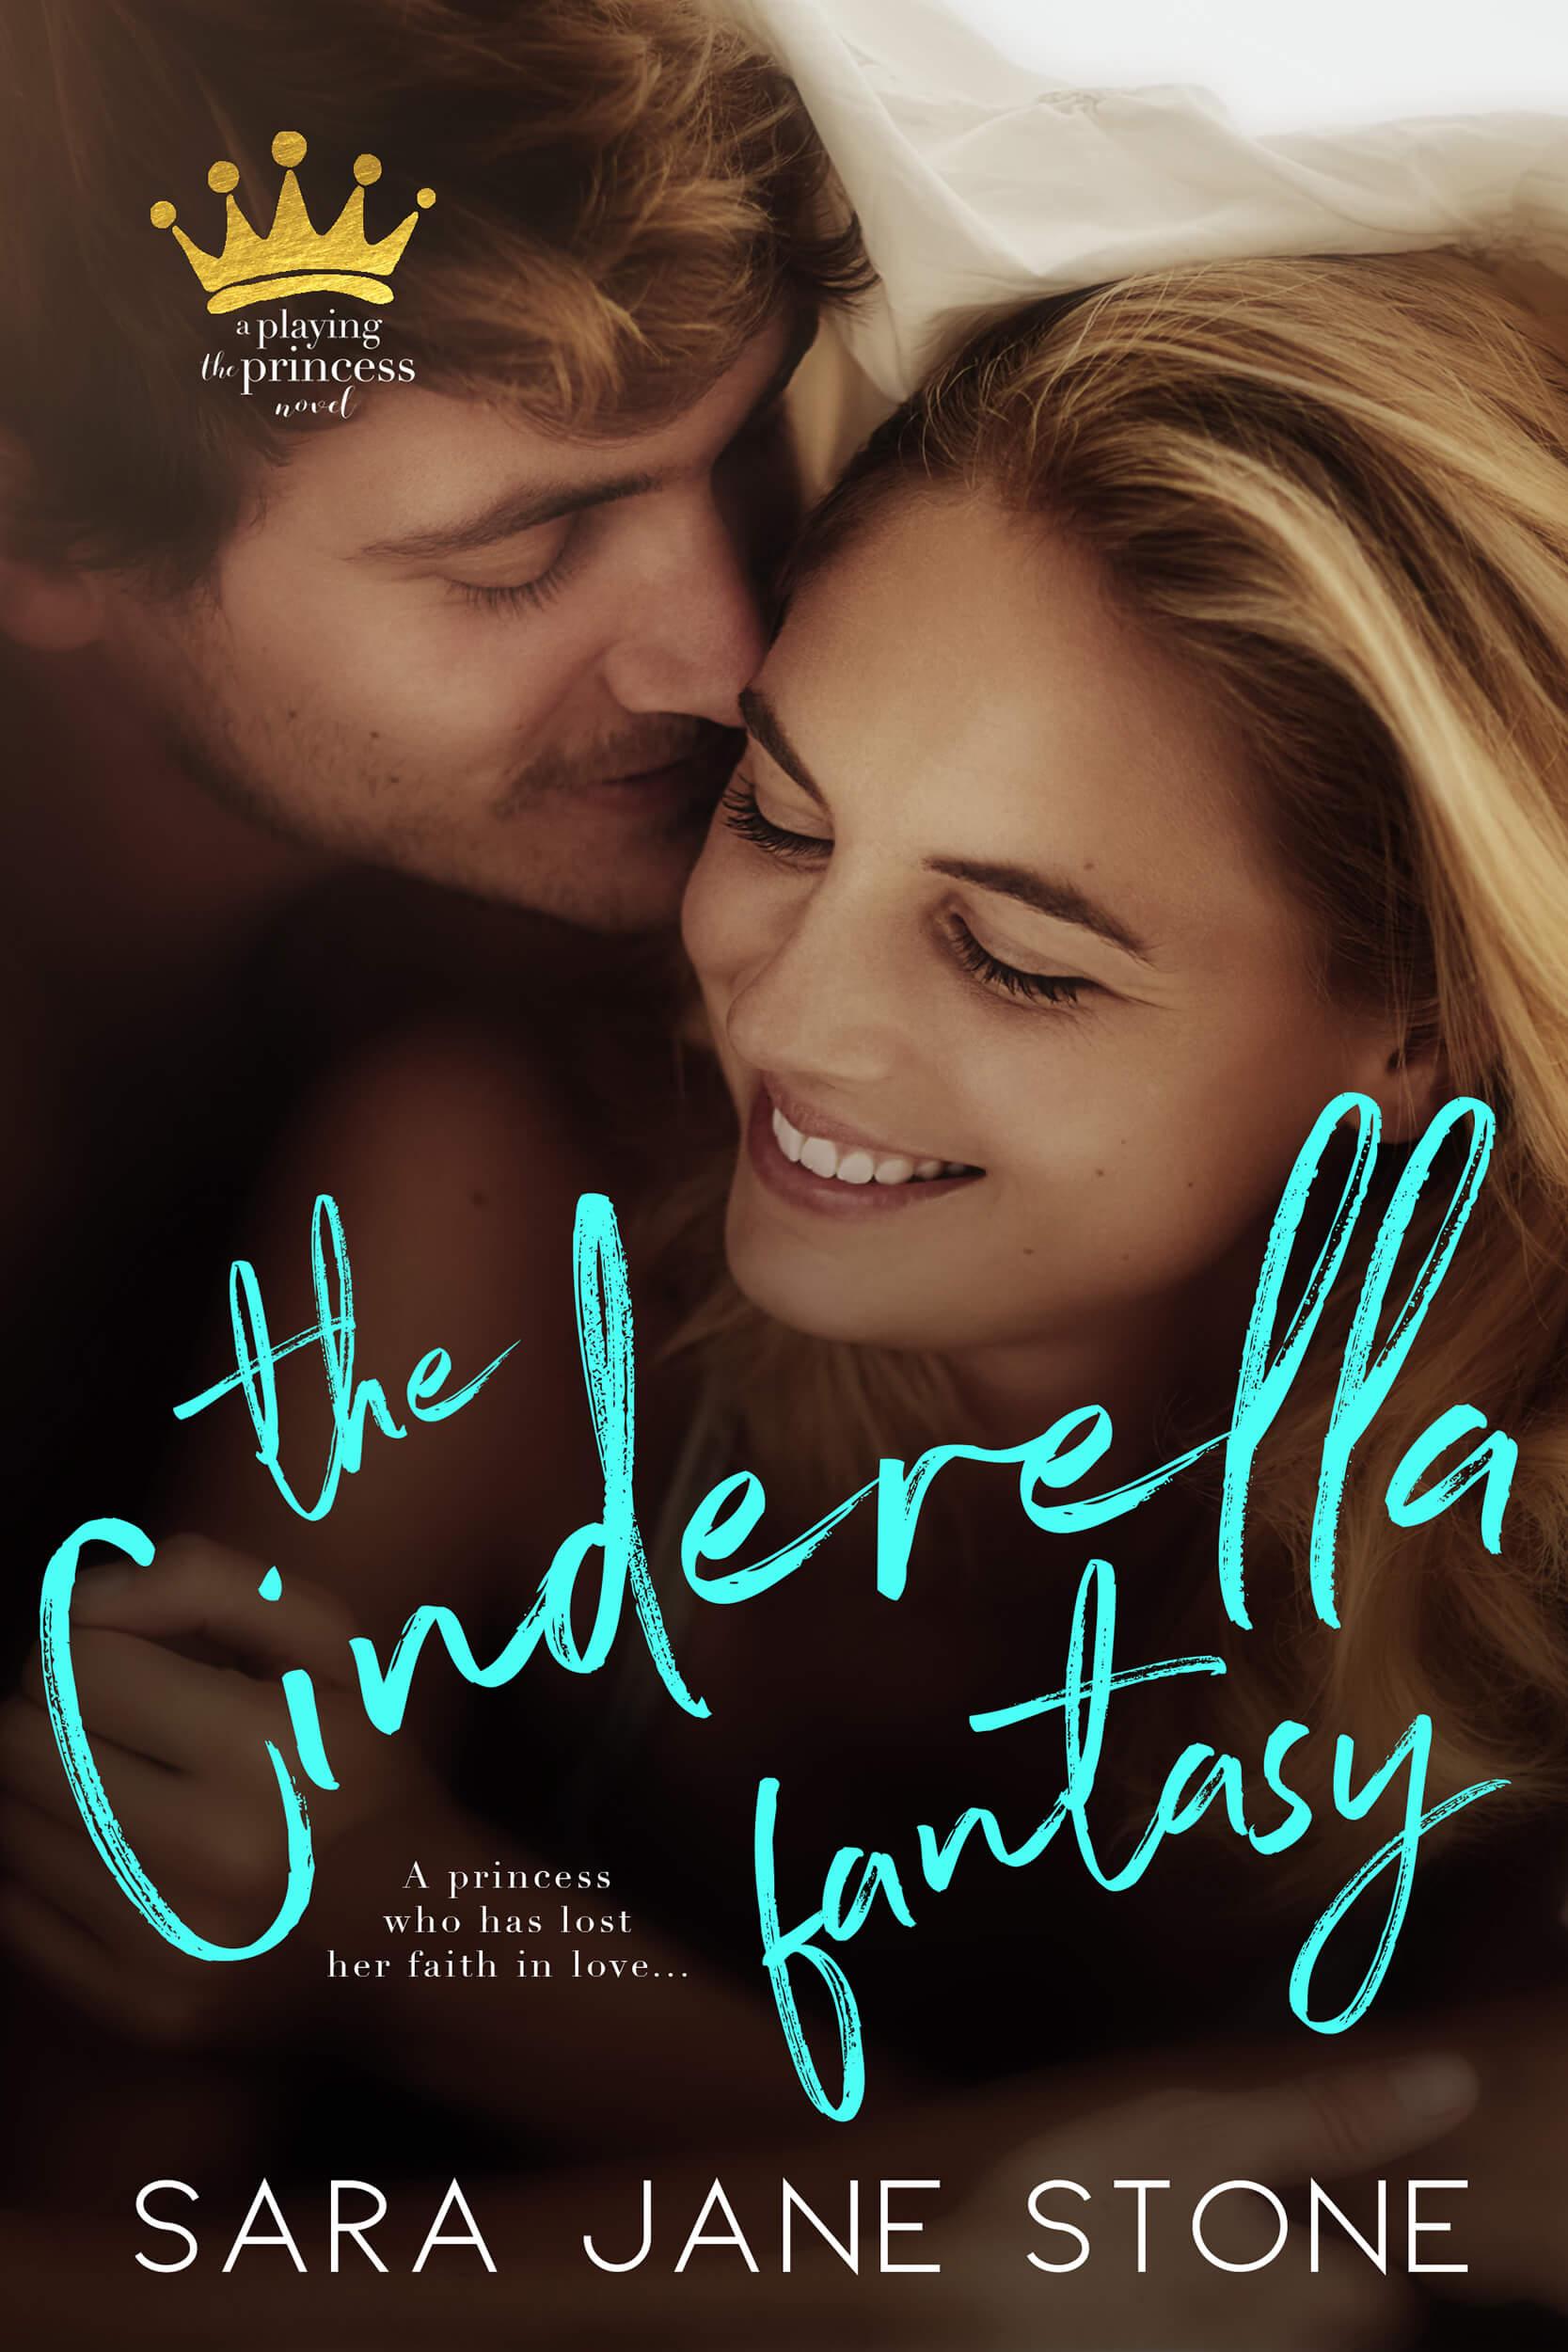 The Cinderella Fantasy by Sara Jane Stone: New Release